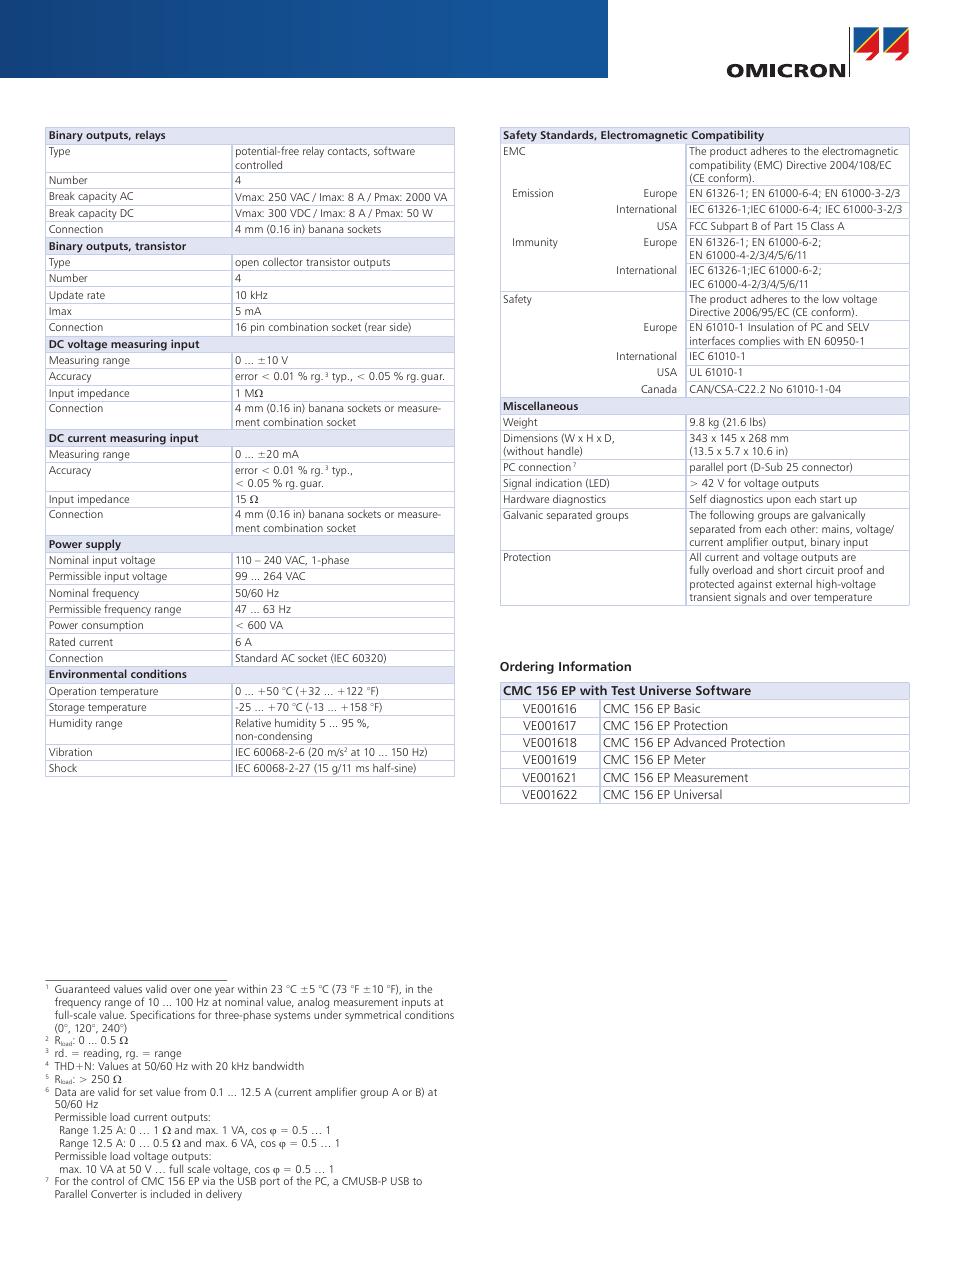 atec omicron cmc 156 user manual page 2 2 original mode rh manualsdir com Auto Manual omicron cpc 100 operating manual